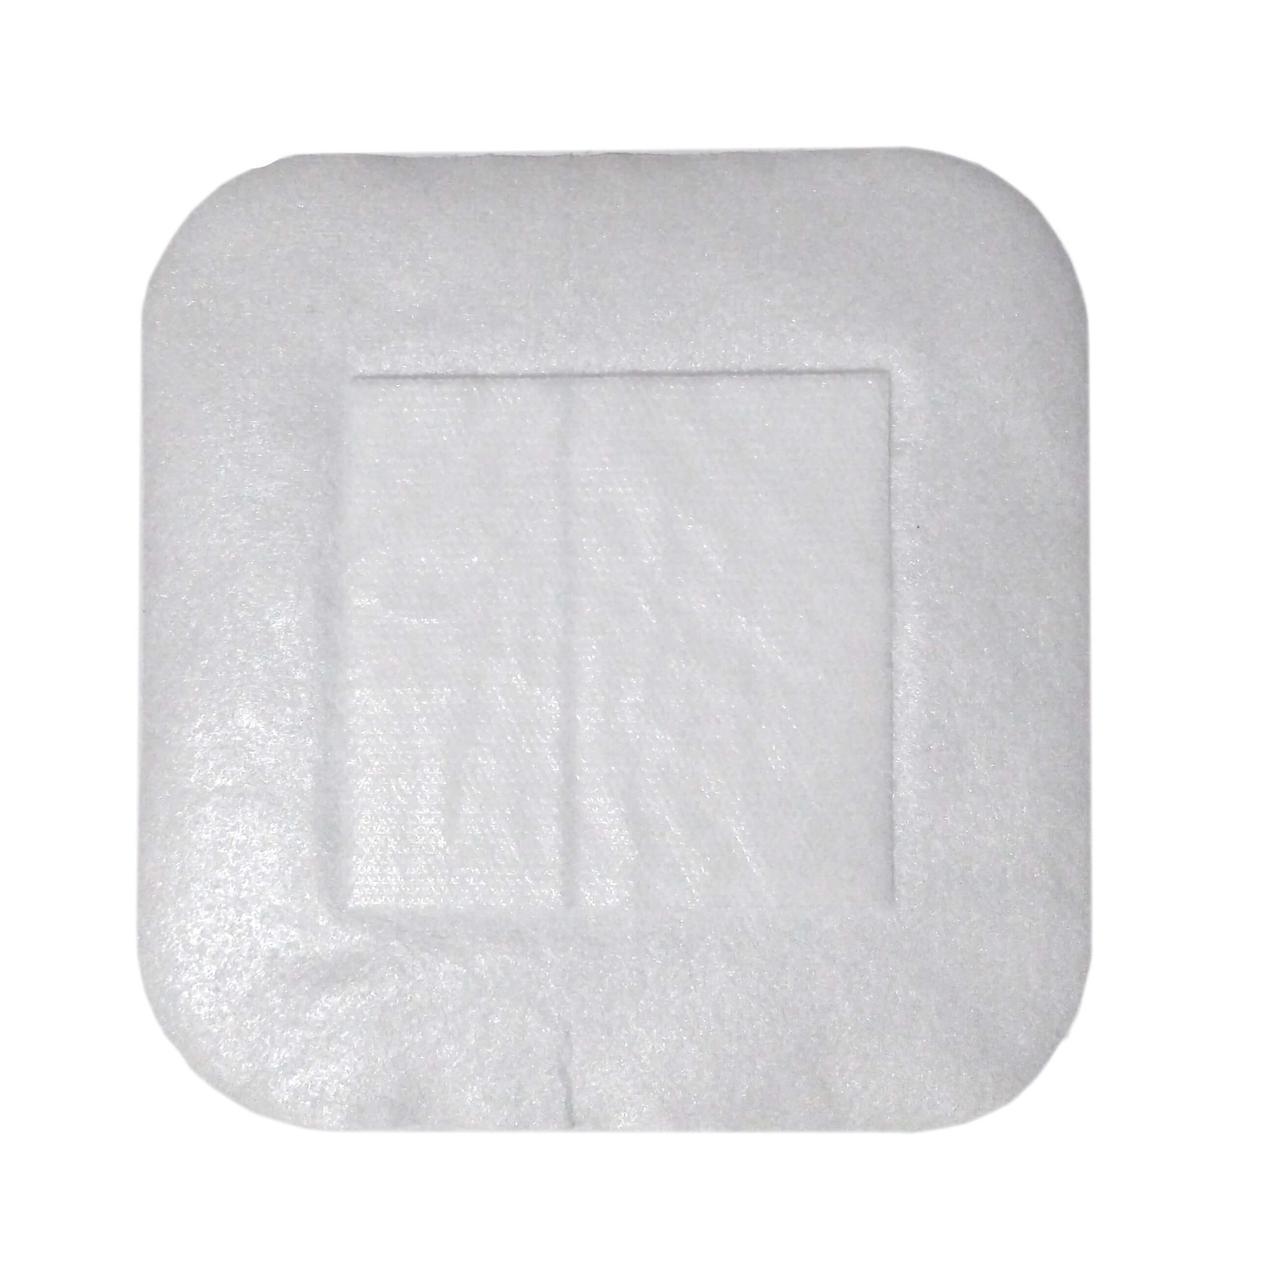 Cosmopor Steril 10x10 см - повязка стерильная на рану